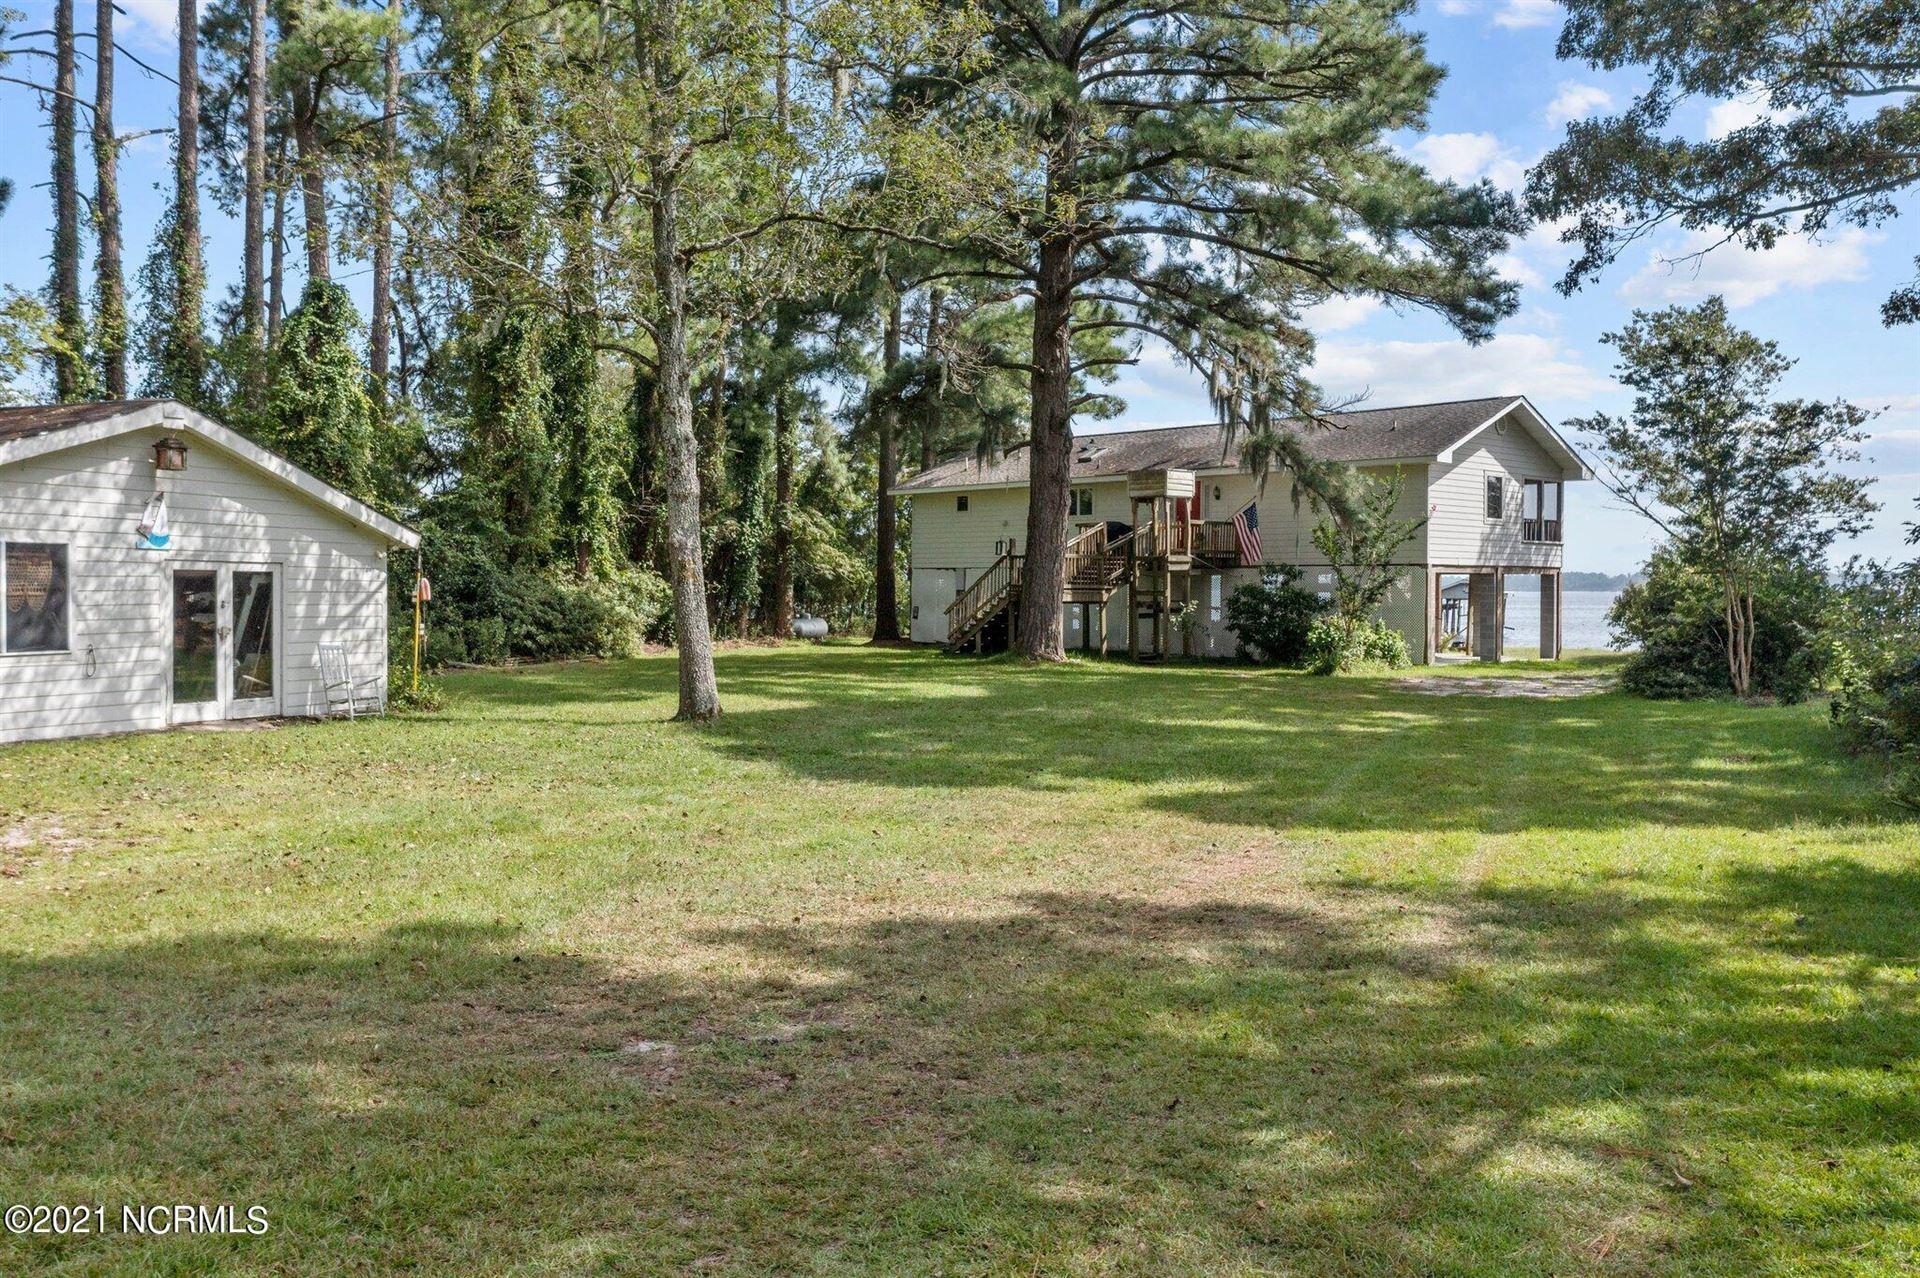 Photo of 115 Goose Creek Drive, Washington, NC 27889 (MLS # 100286720)